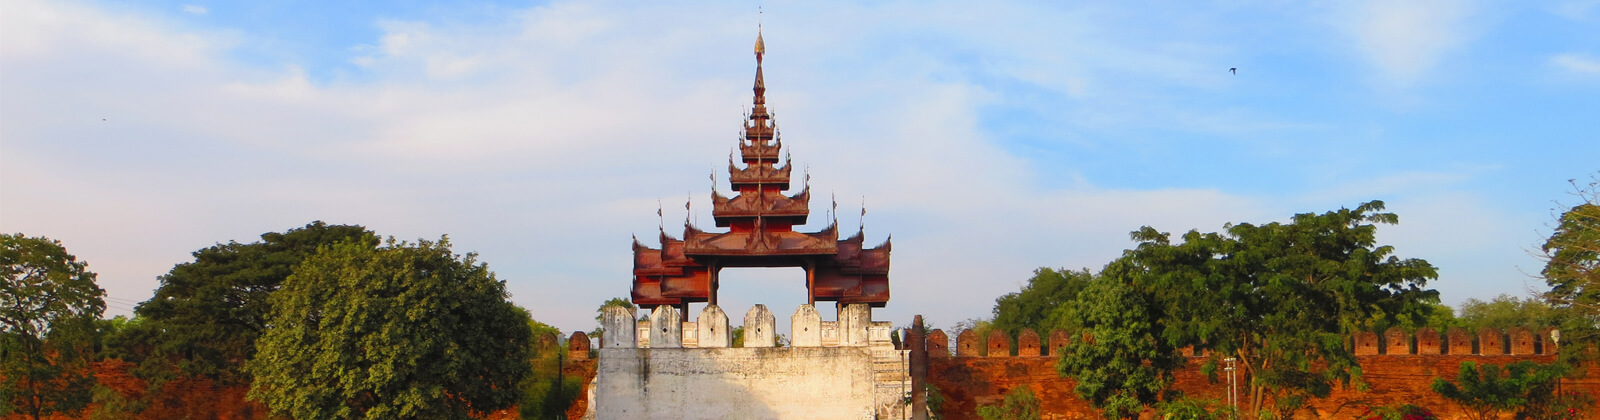 Mandalay Weather